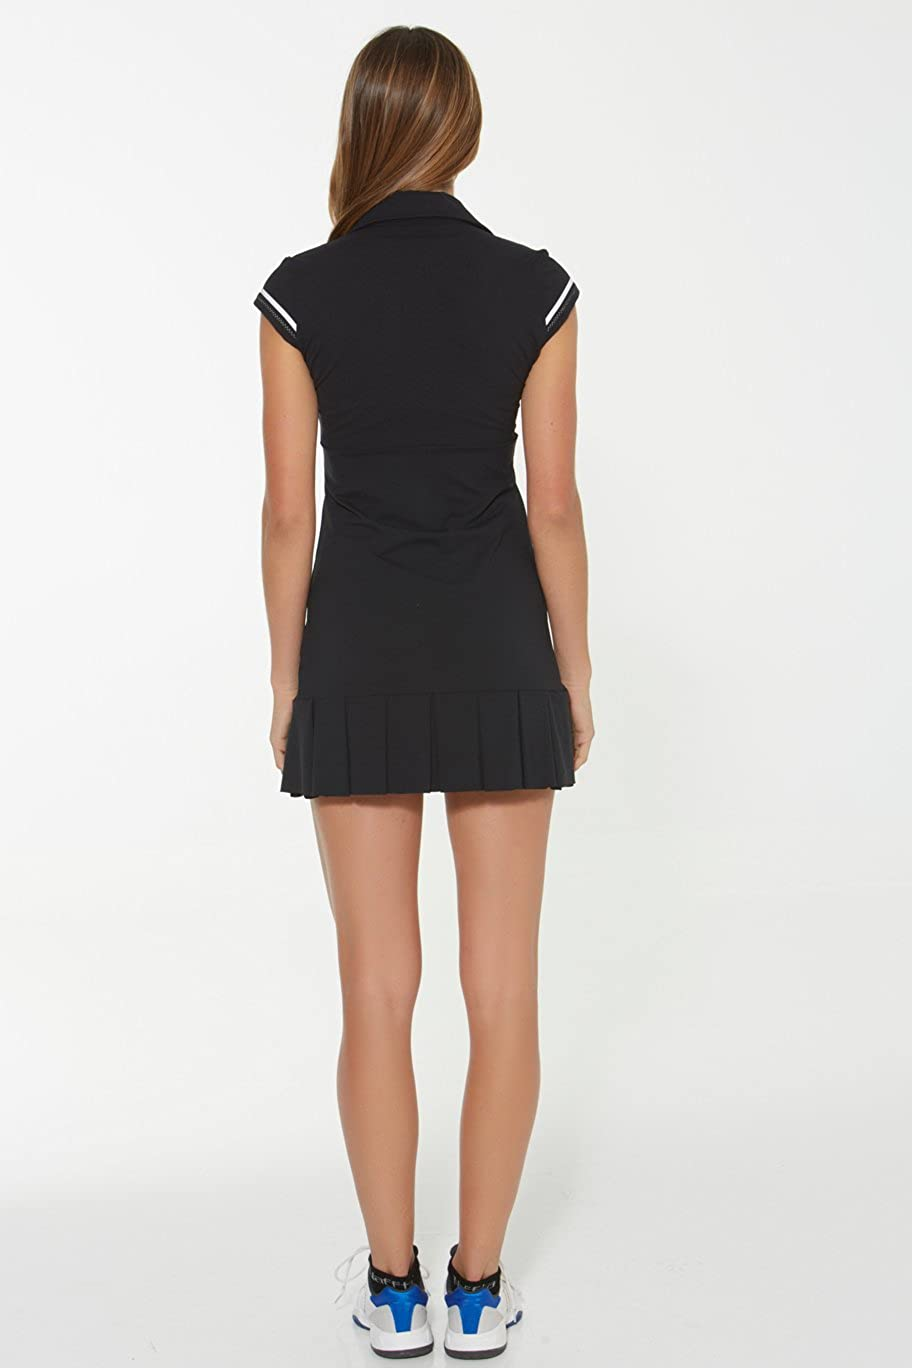 Naffta Tenis Padel - Vestido para Mujer